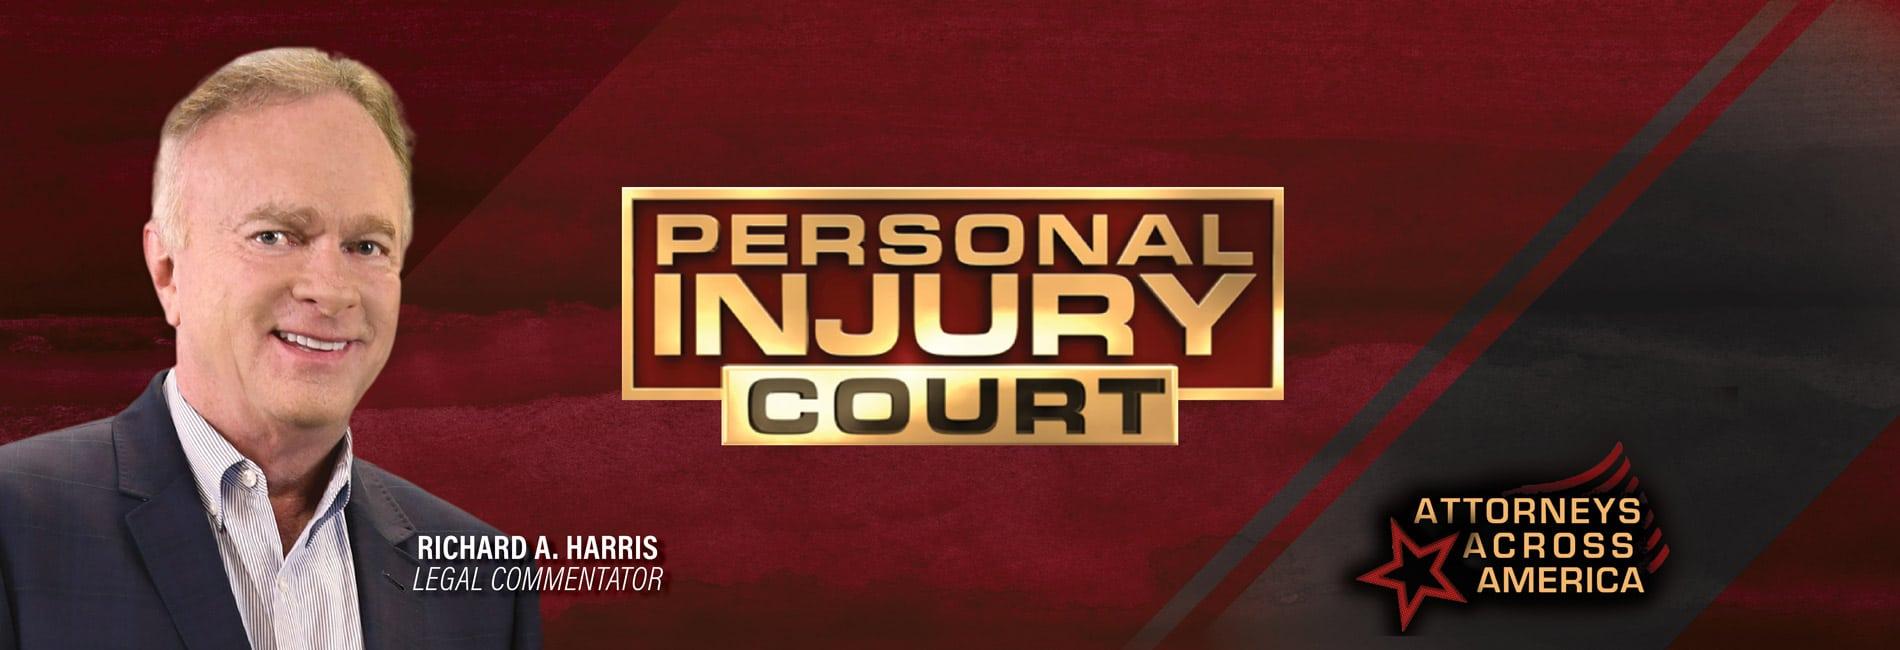 Richard Harris Personal Injury Court